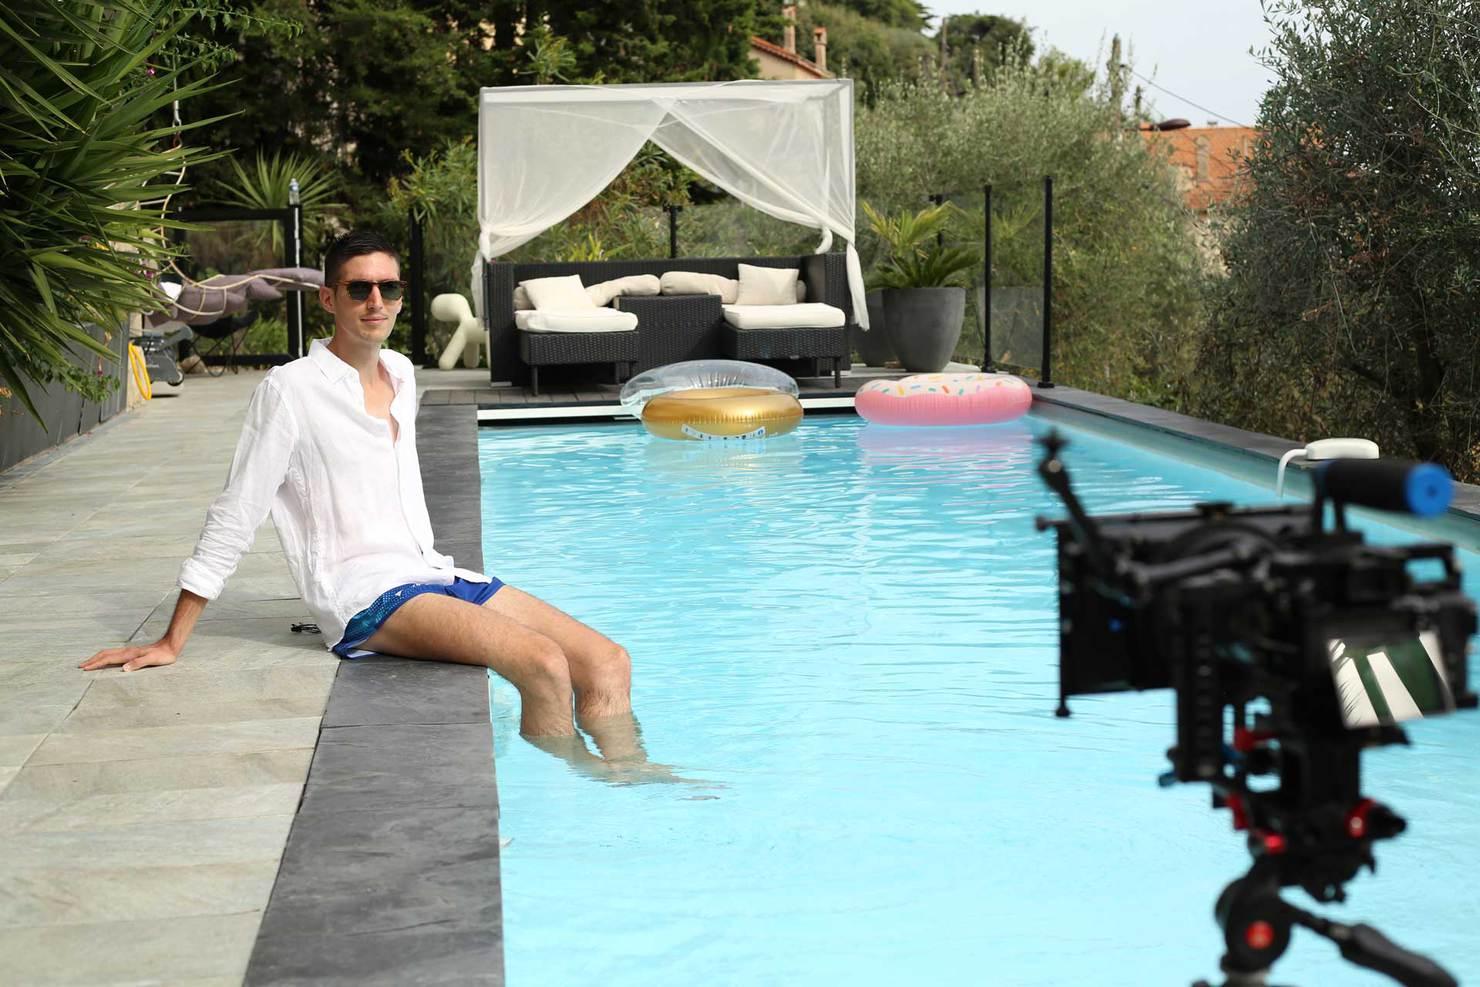 A propos : pause piscine